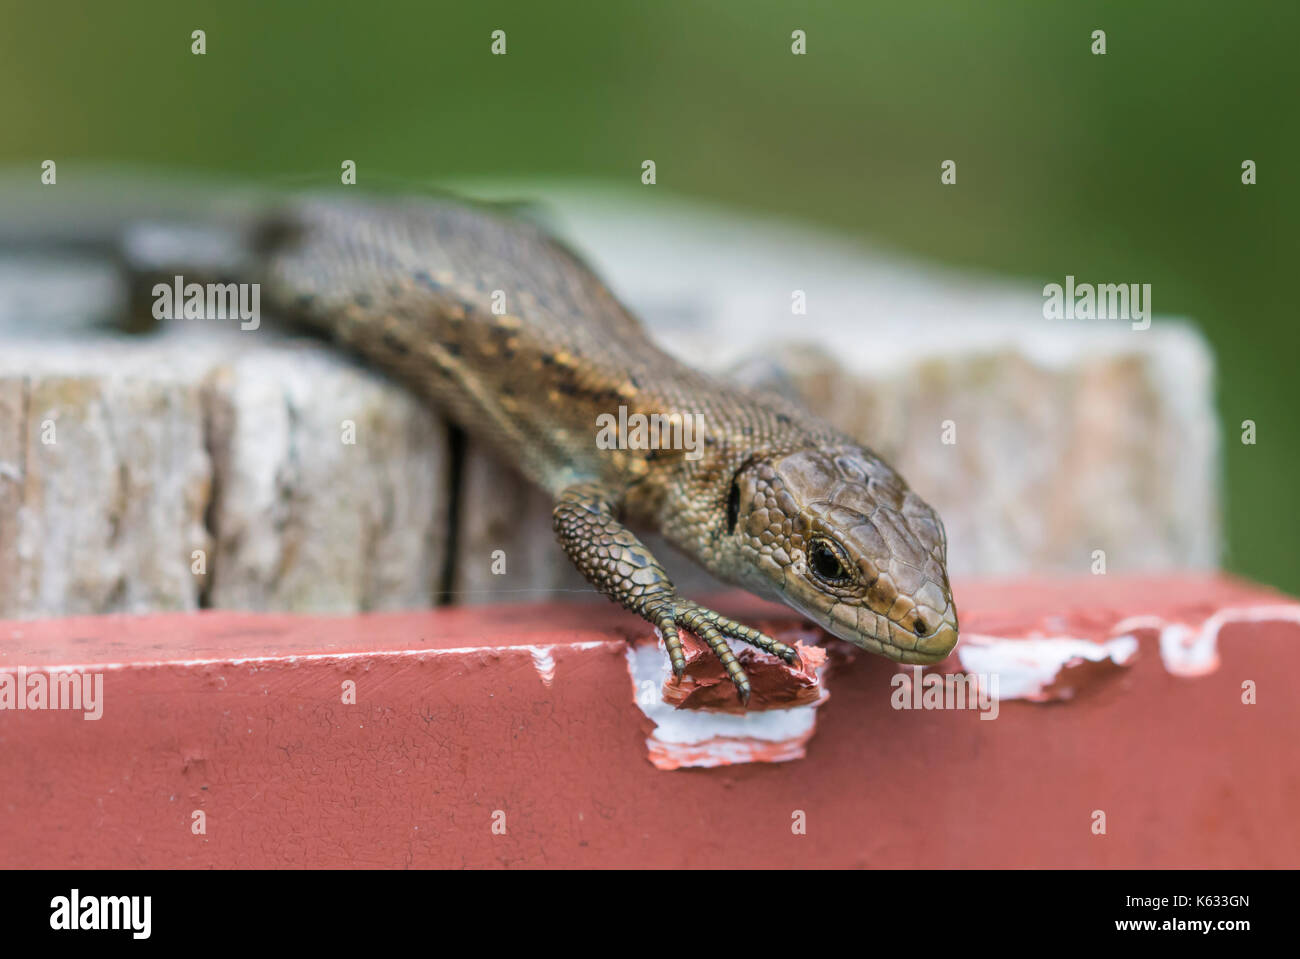 Lagarto común adulto (Zootoca vivipara), AKA Ovíparos o lagarto lagarto Euroasiática cerca del agua, en el otoño, en el sur de Inglaterra, Reino Unido. Lizard closeup. Foto de stock